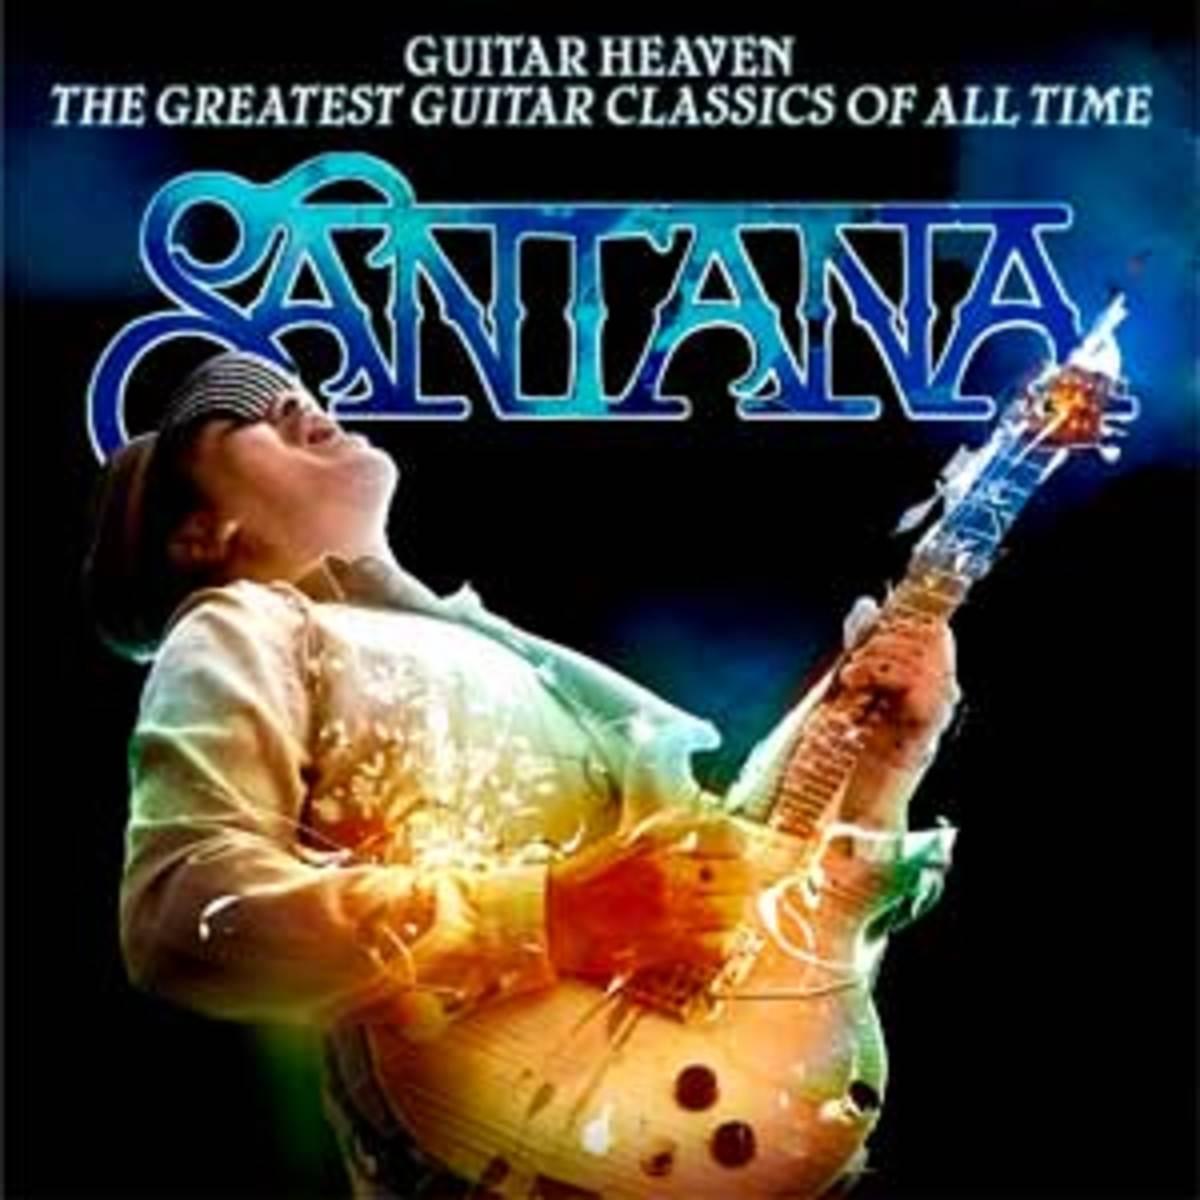 SANTANA_GUITAR_HEAVEN_Cover_art